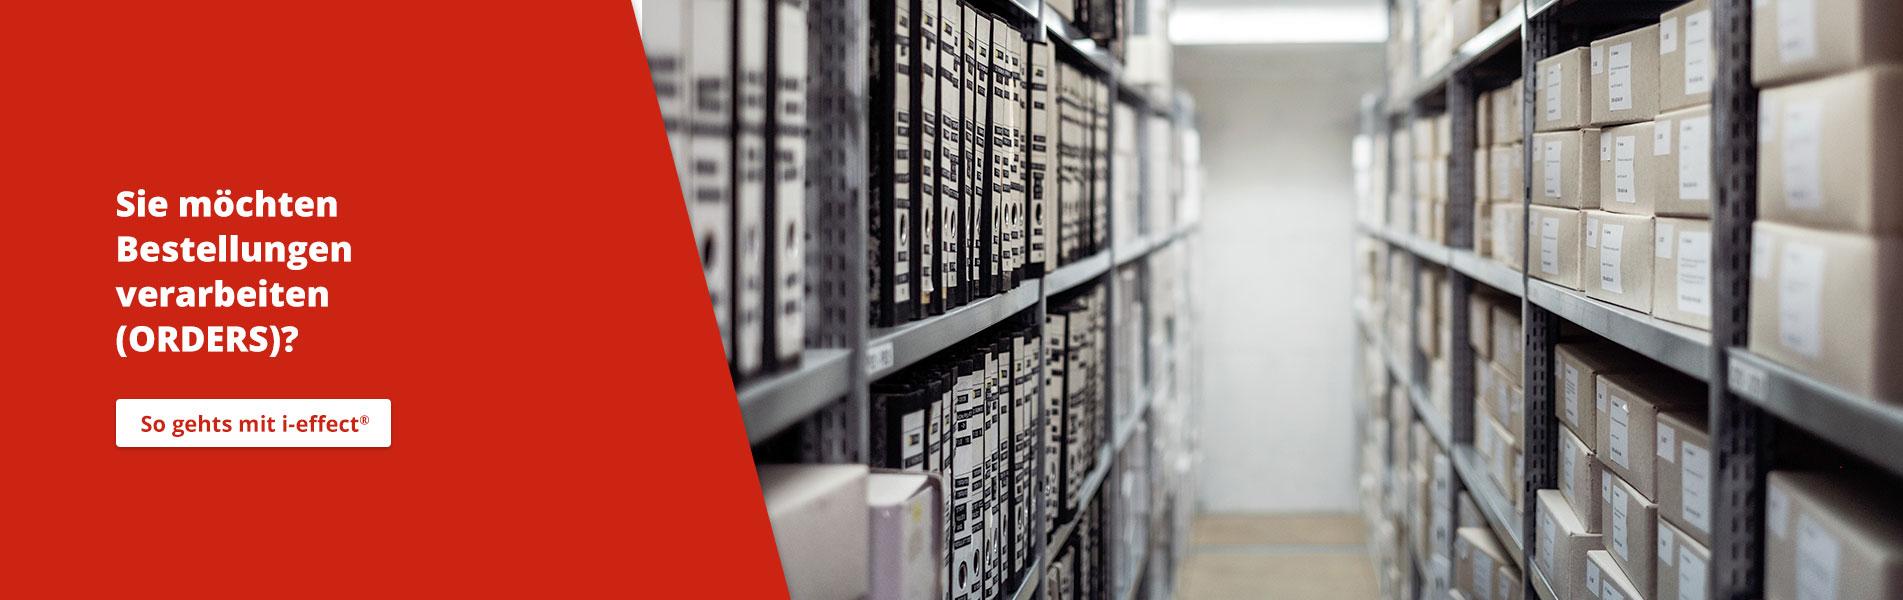 EDI Orders IBM AS400 i‑effect<sup>®</sup>